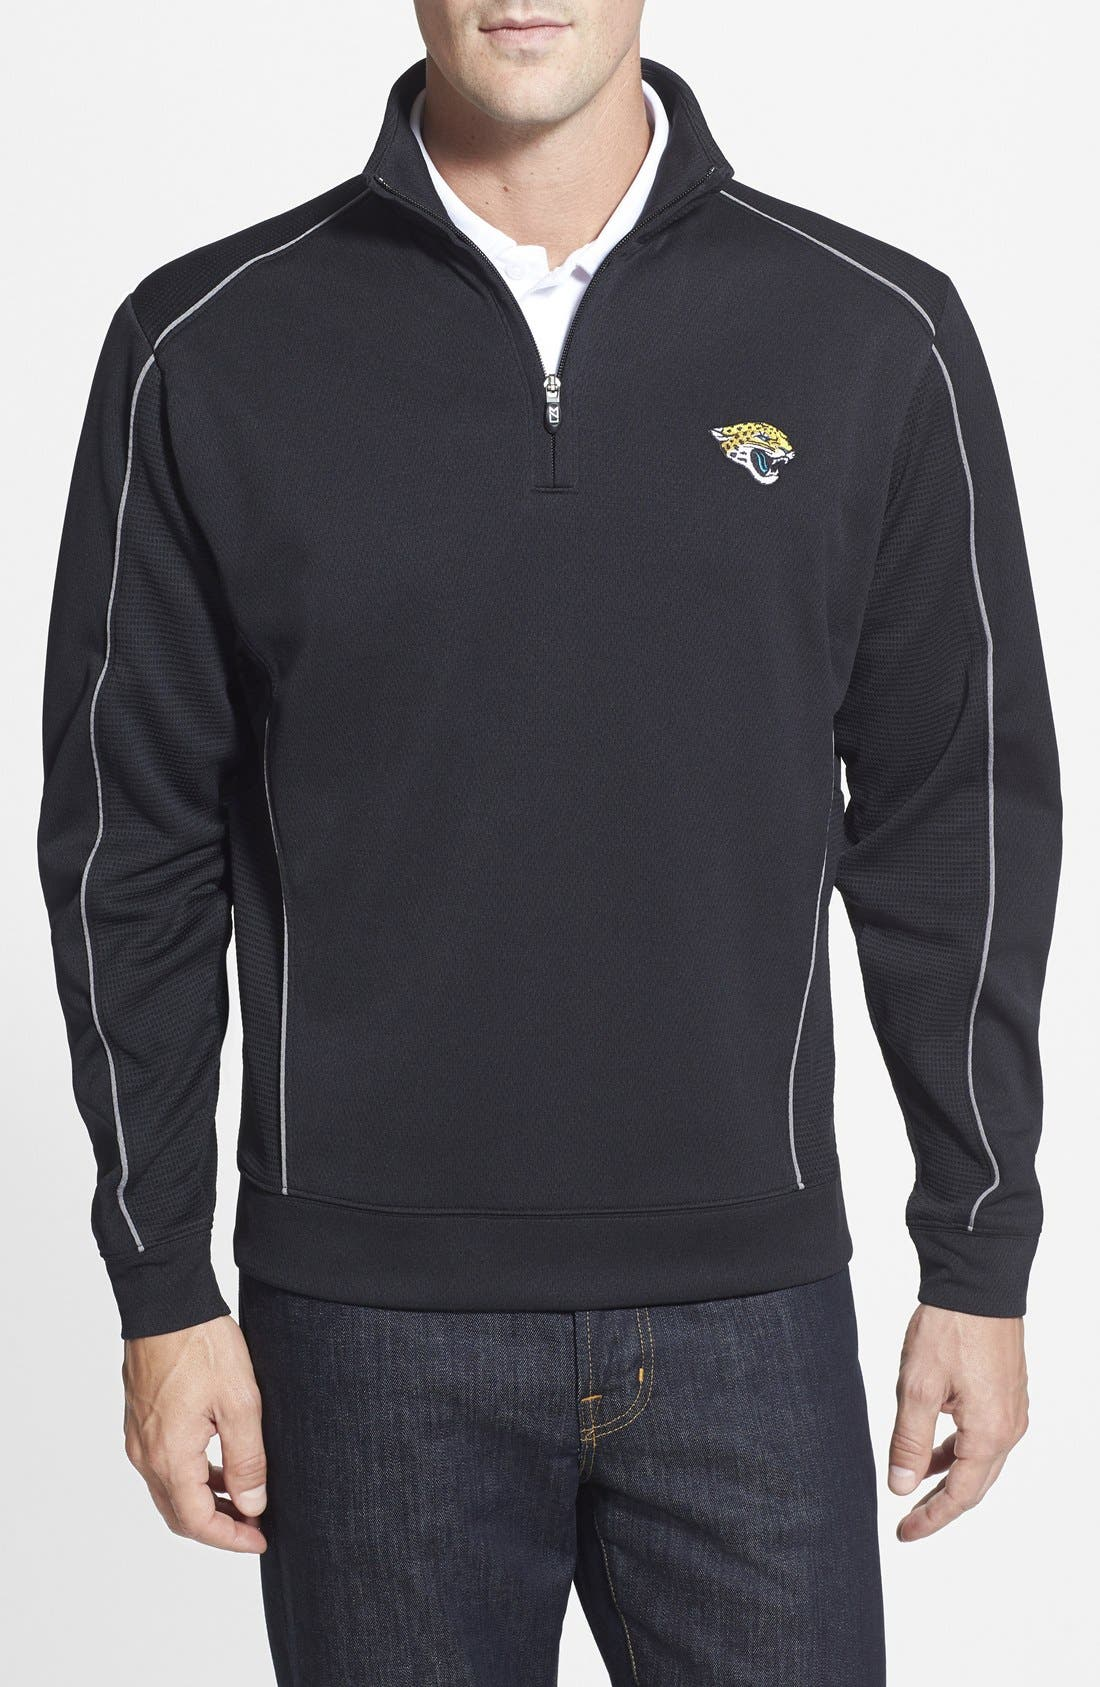 CUTTER & BUCK Jacksonville Jaguars - Edge DryTec Moisture Wicking Half Zip Pullover, Main, color, 001